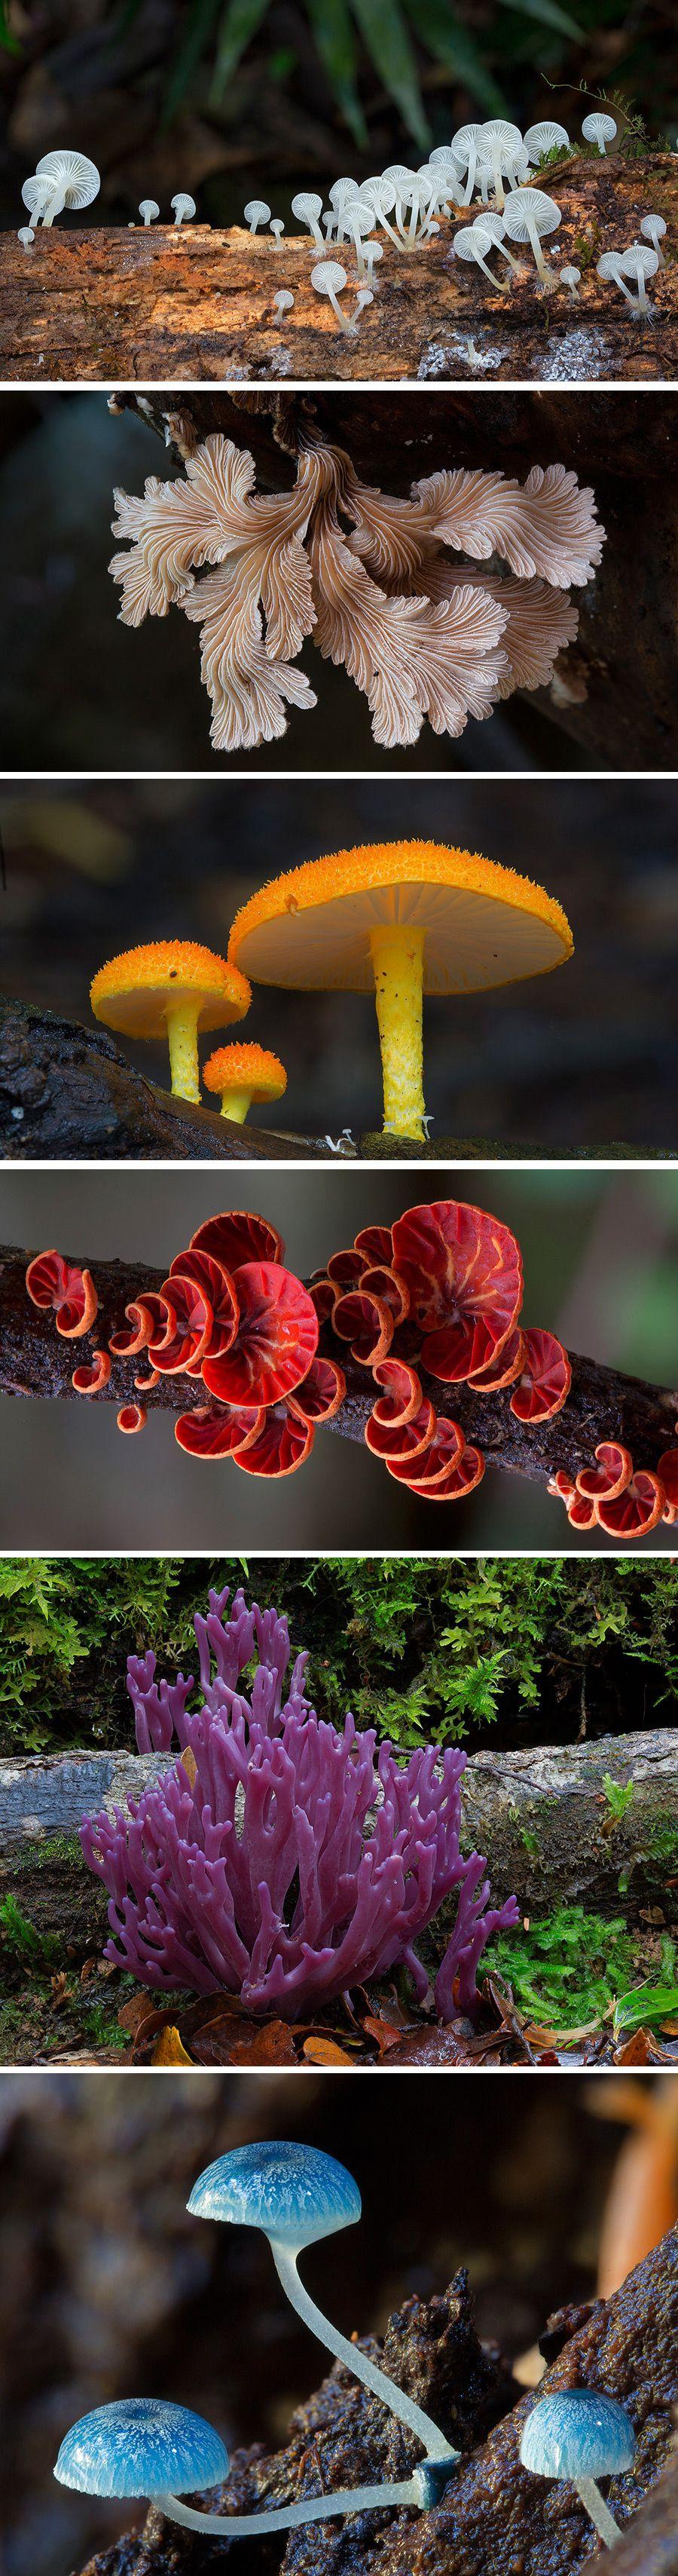 Clavaria Zollingeri Violets Mushrooms And Mushroom Fungi - Photographer captures the beautiful diversity of australias fungi